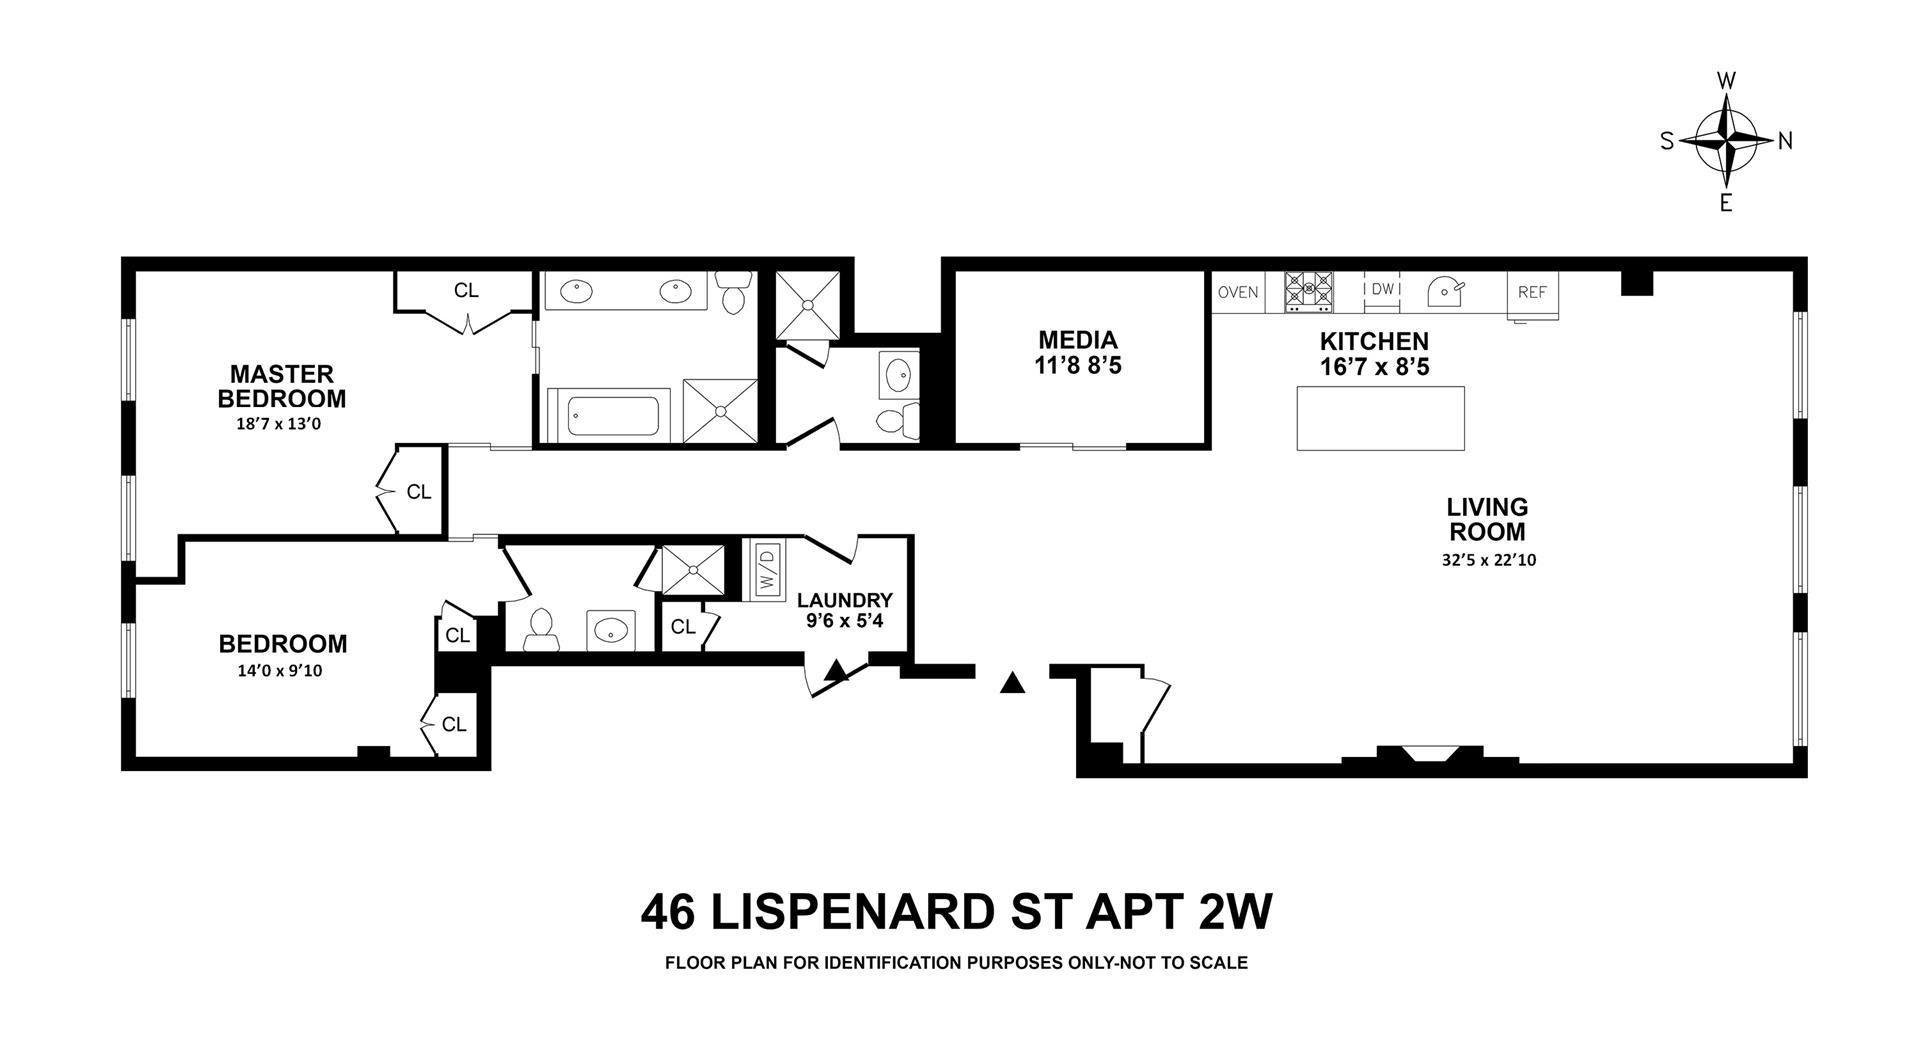 Floor plan of 46 Lispenard St, 2W - TriBeCa, New York